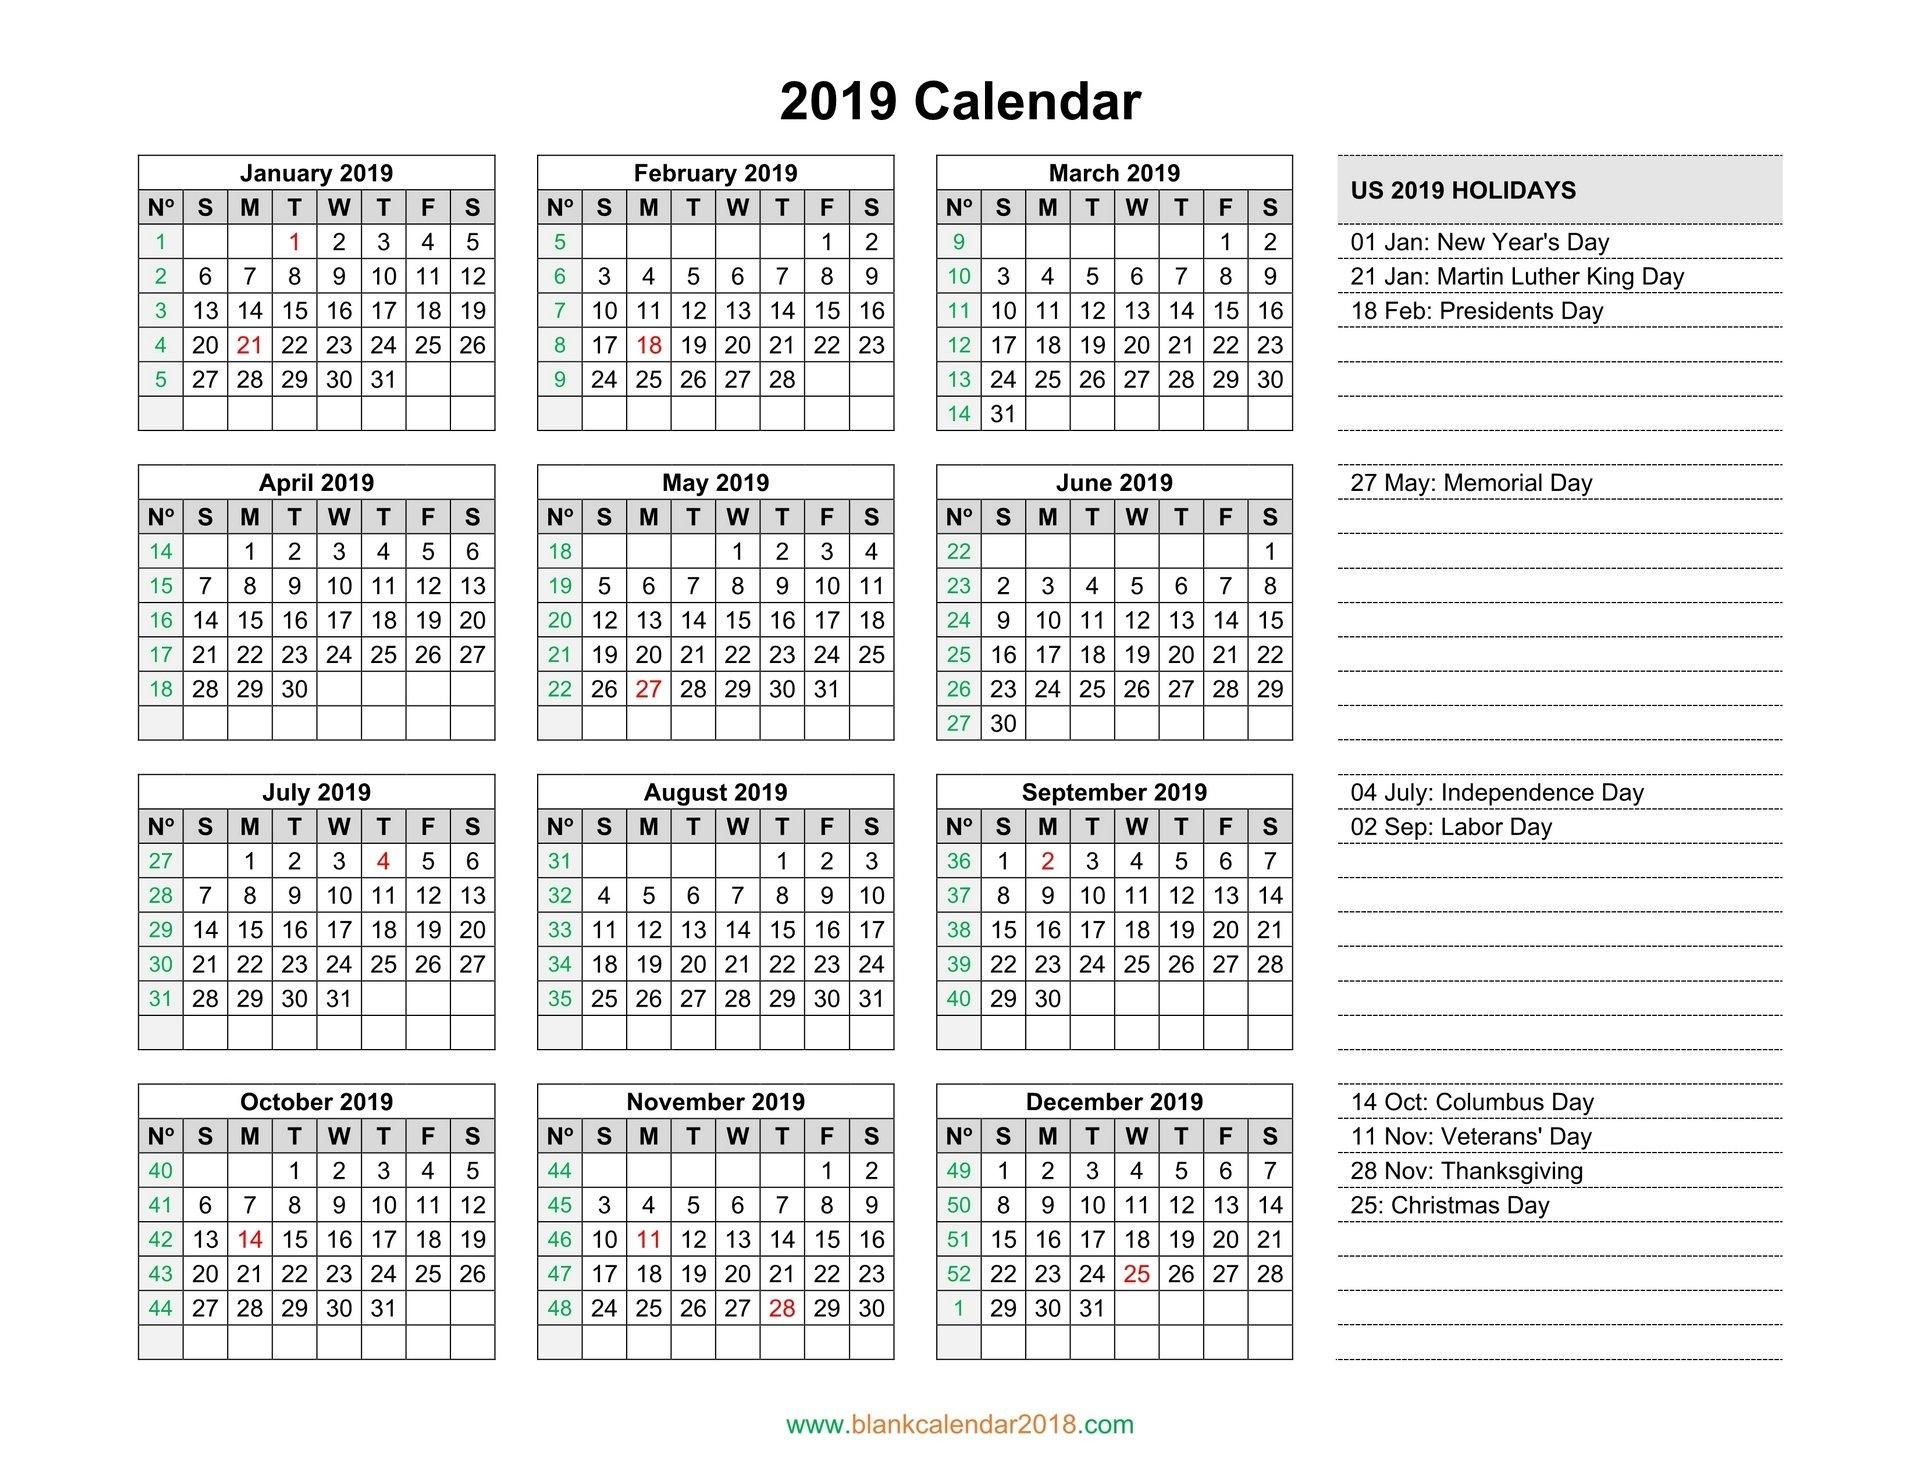 Blank Calendar 2019 Calendar 2019 Showing Holidays